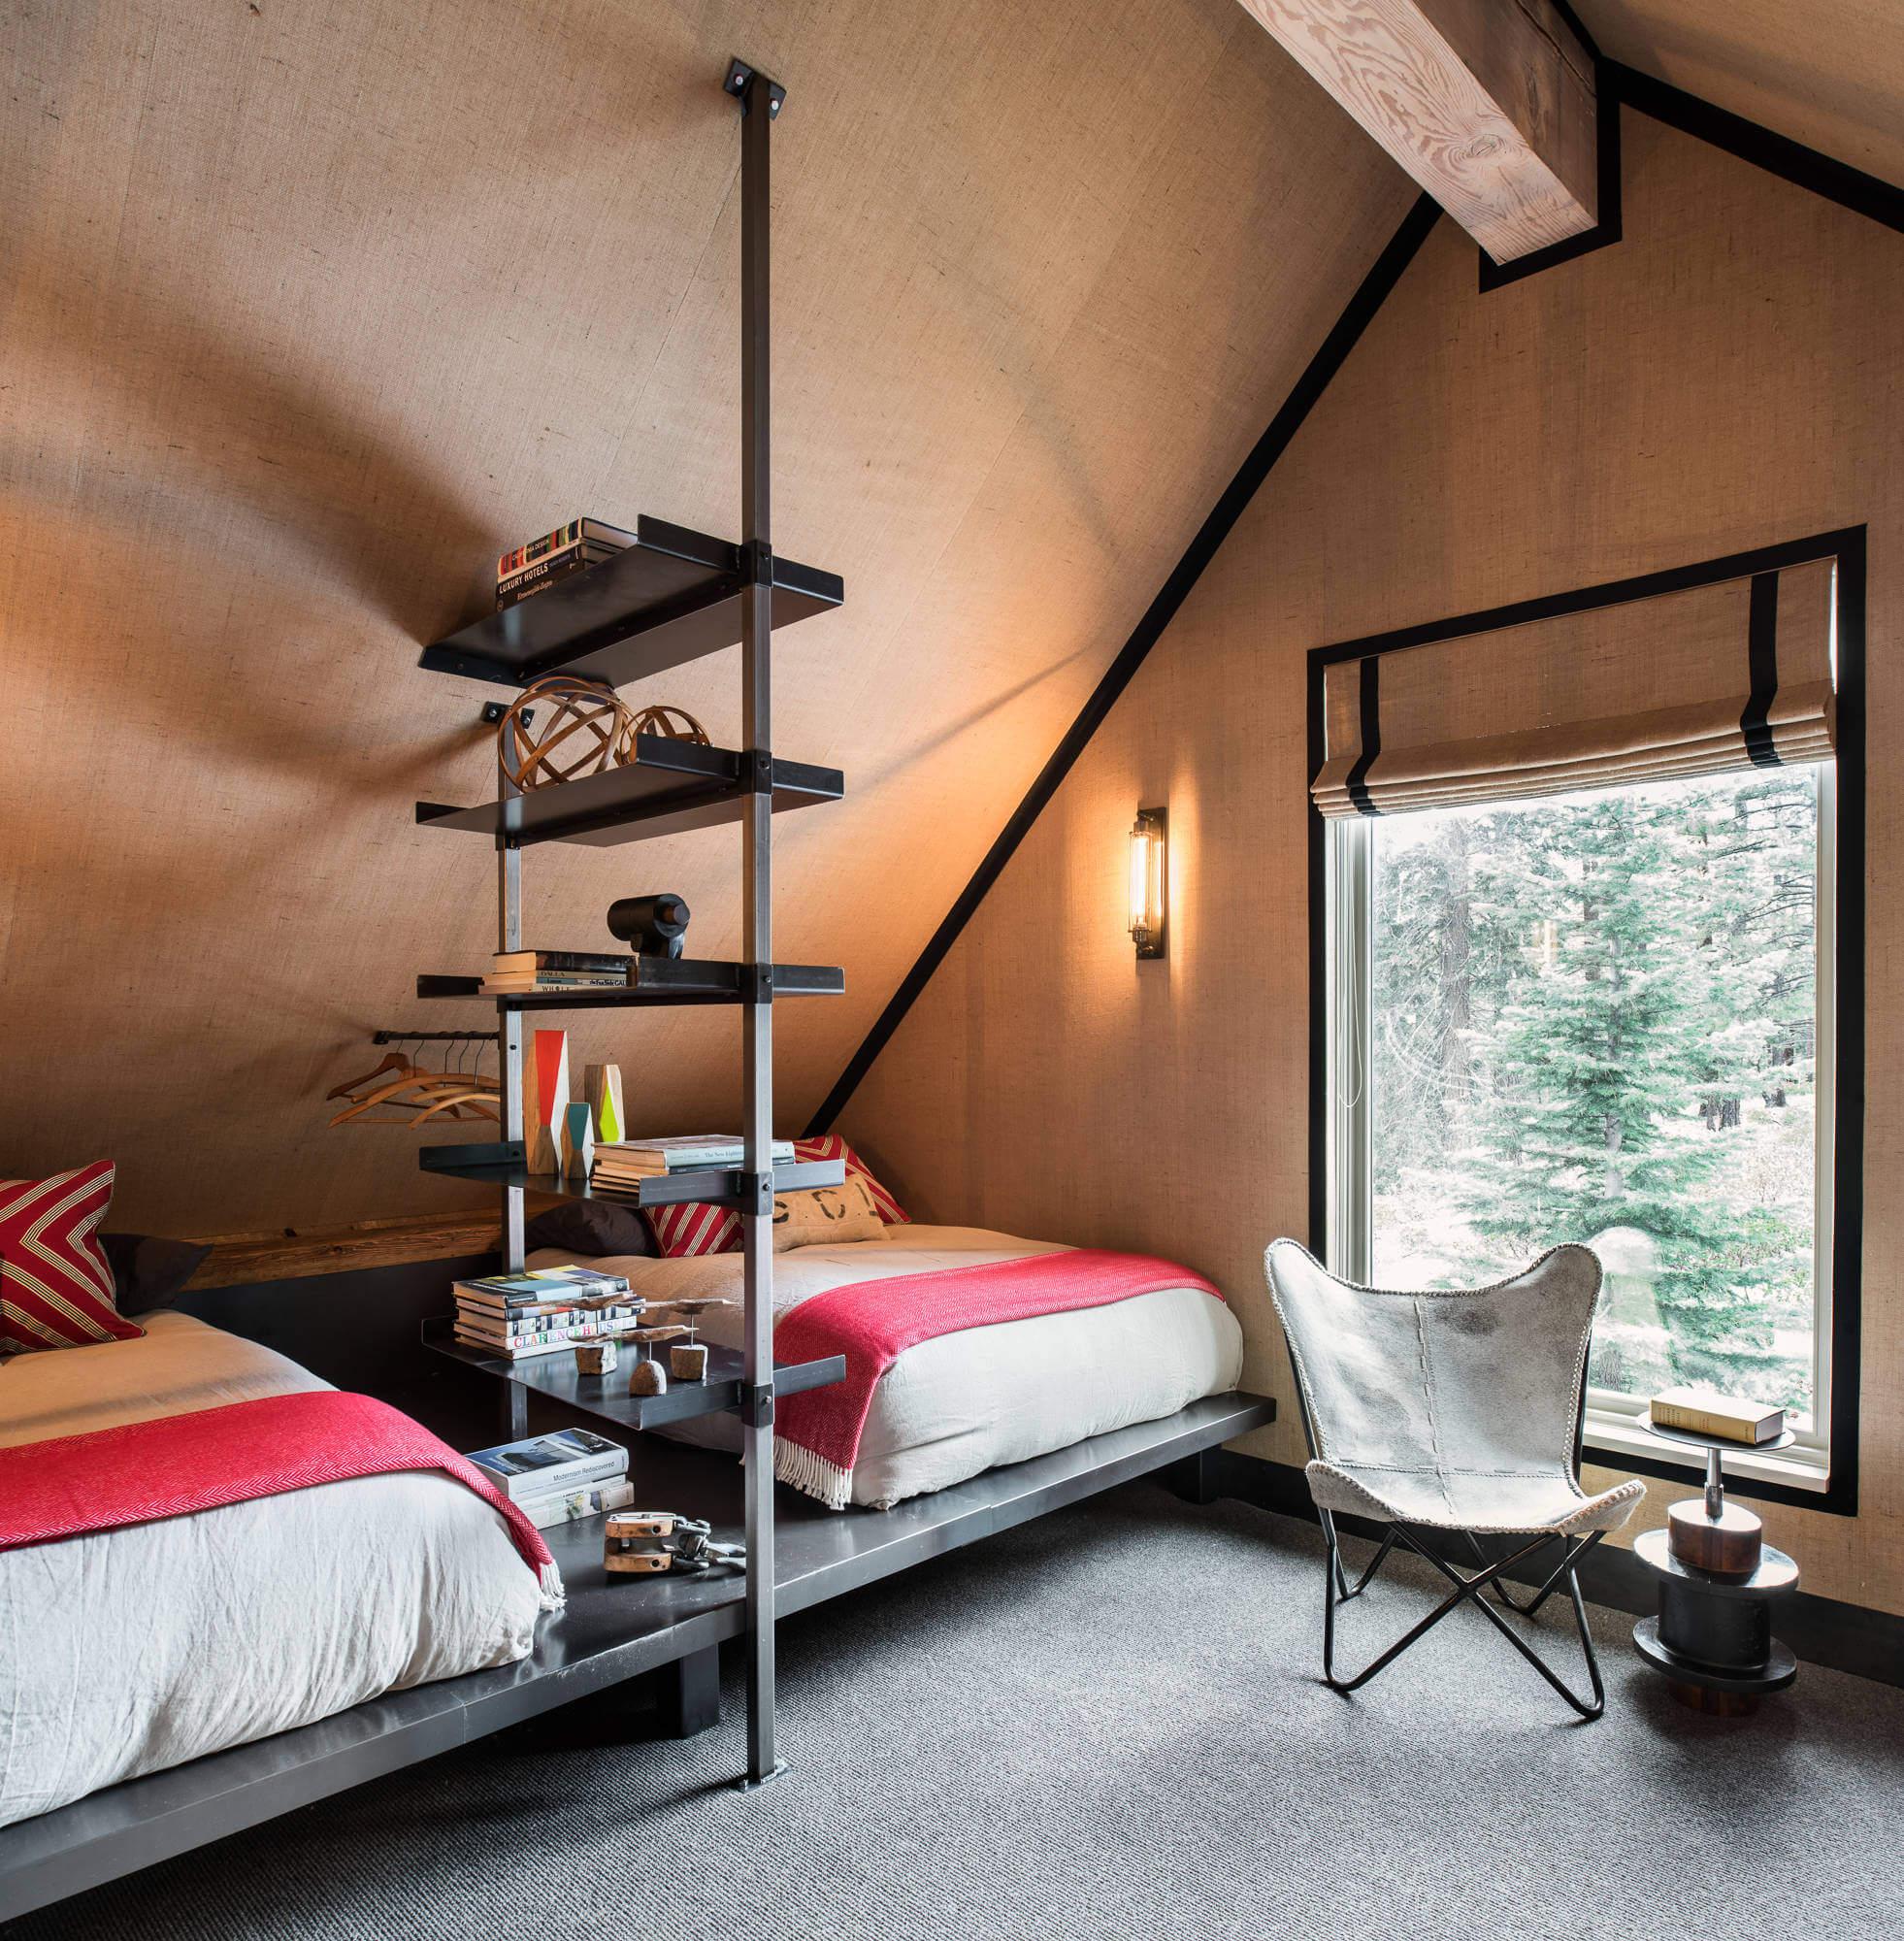 truckee-retreat-antonio-martins-interior-design-11